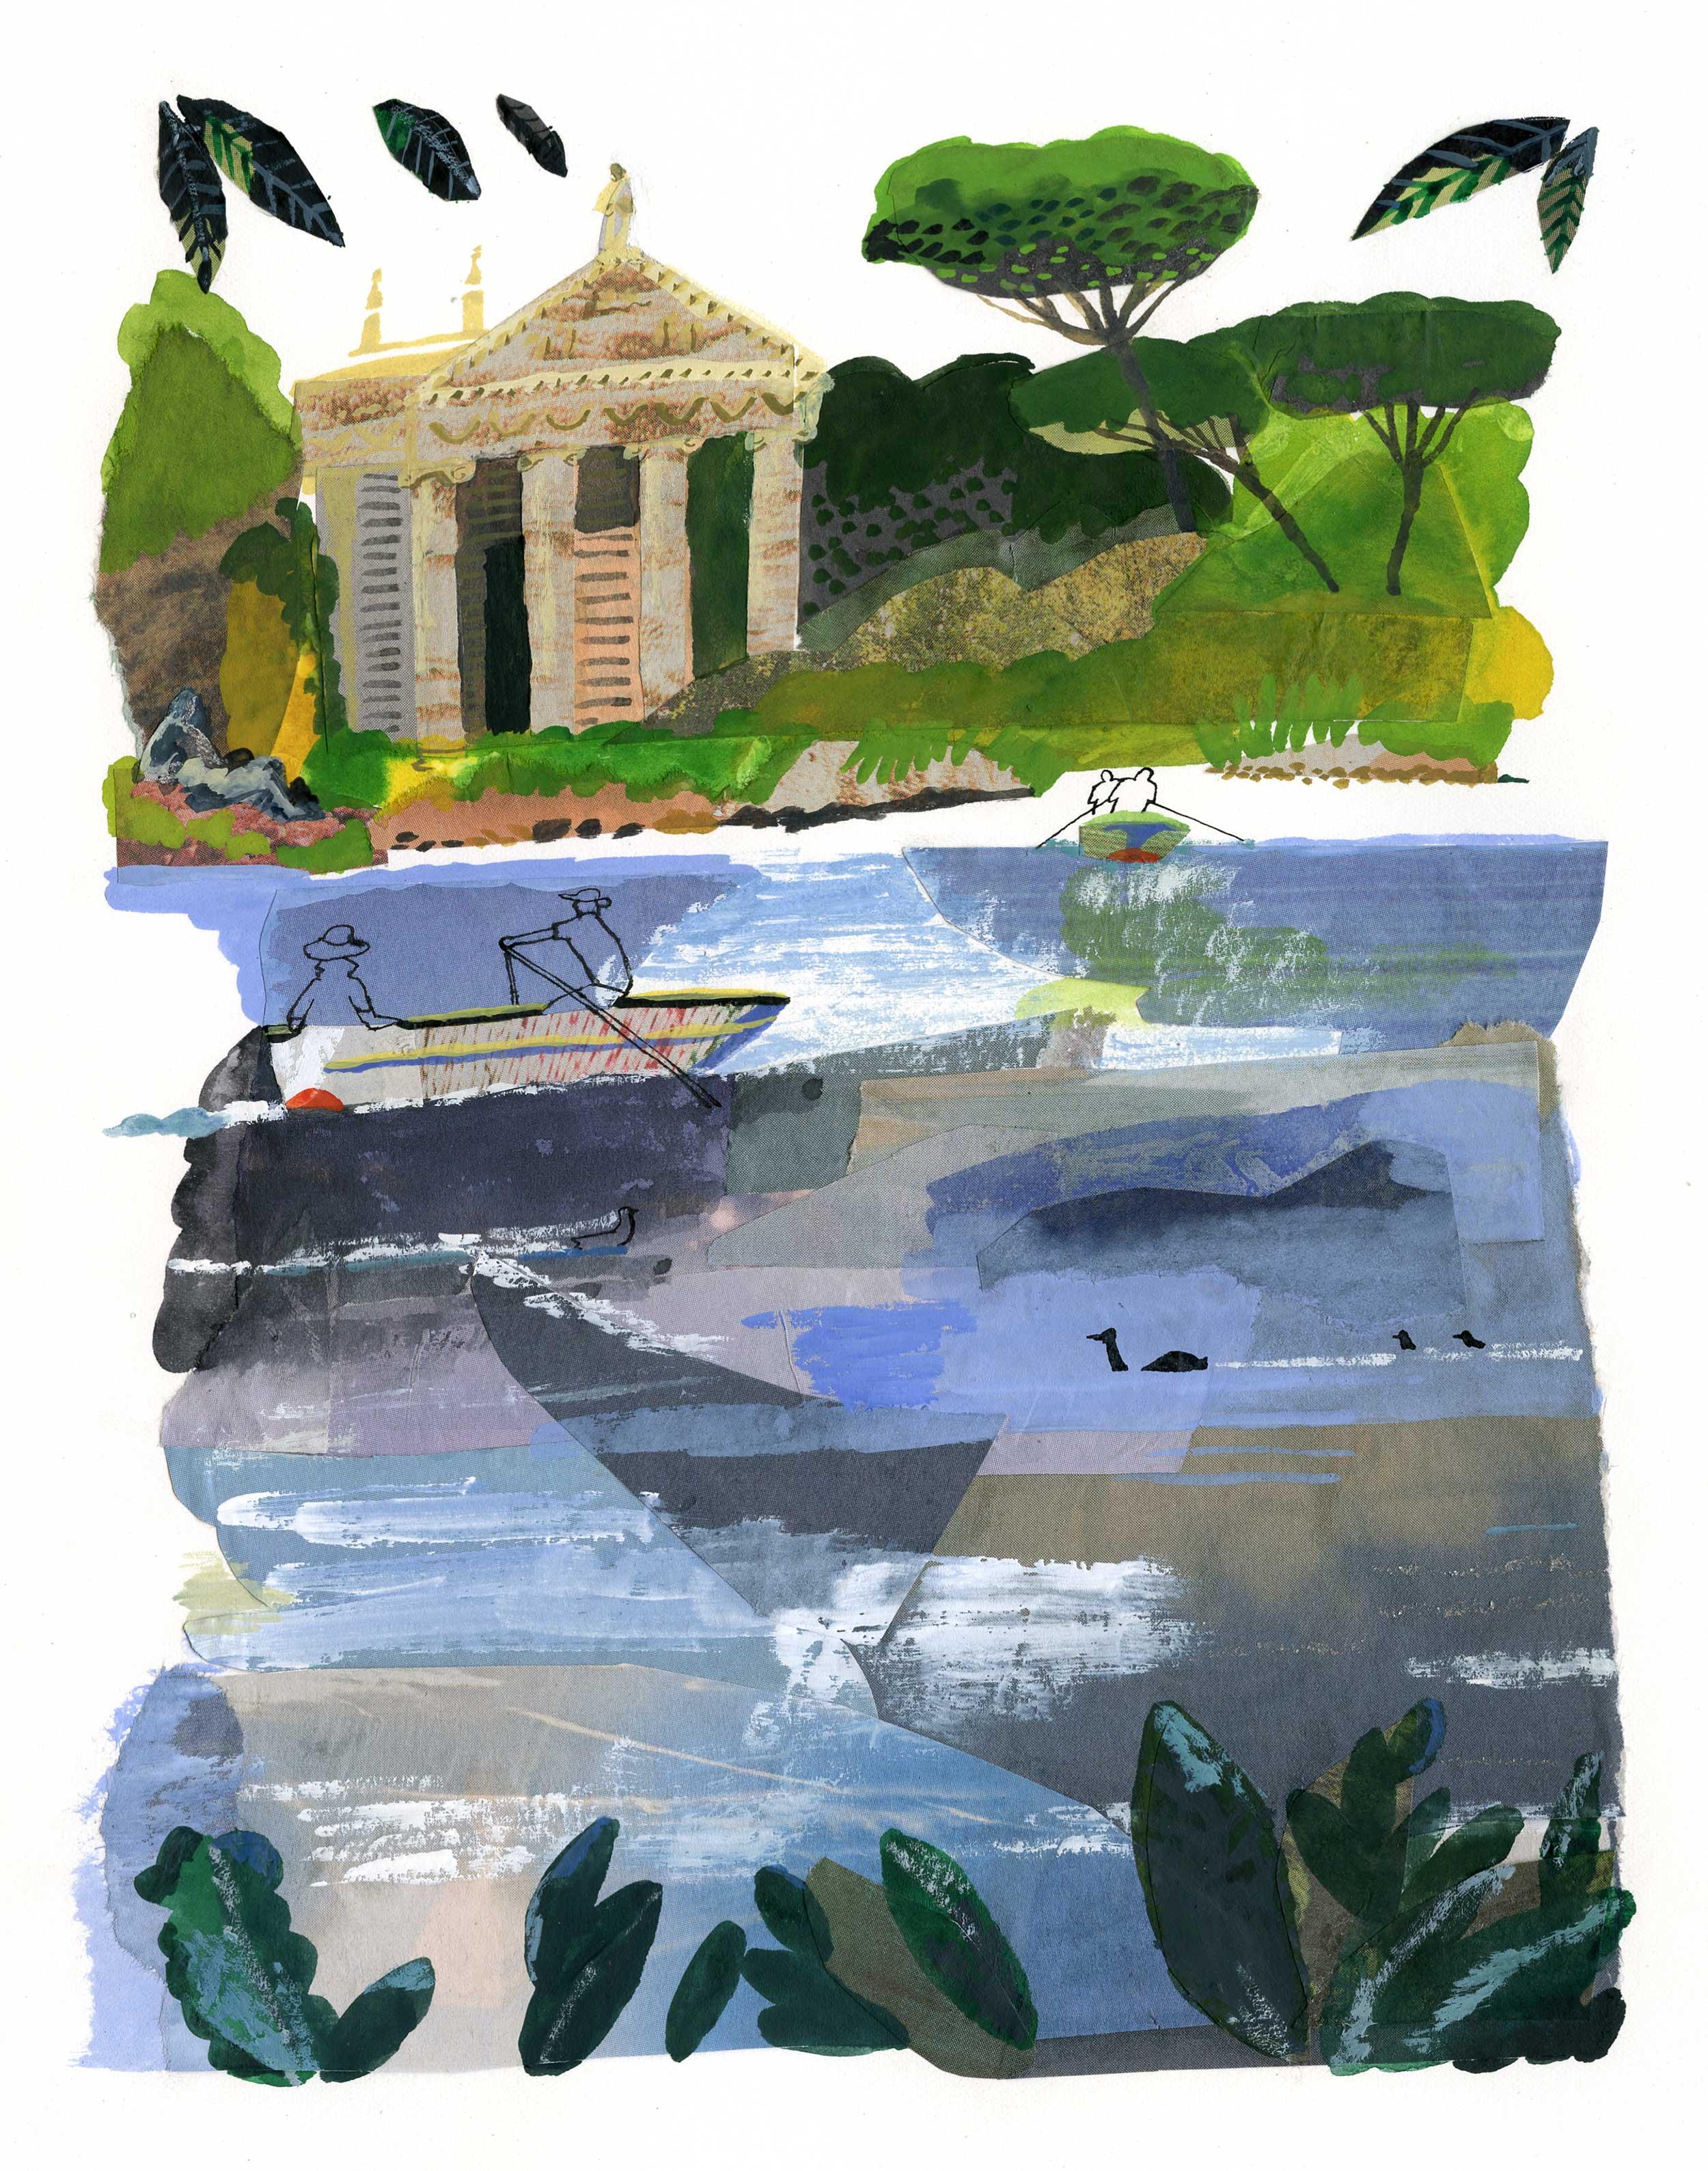 St Regis Beyond illustrations by James Oses, image 7